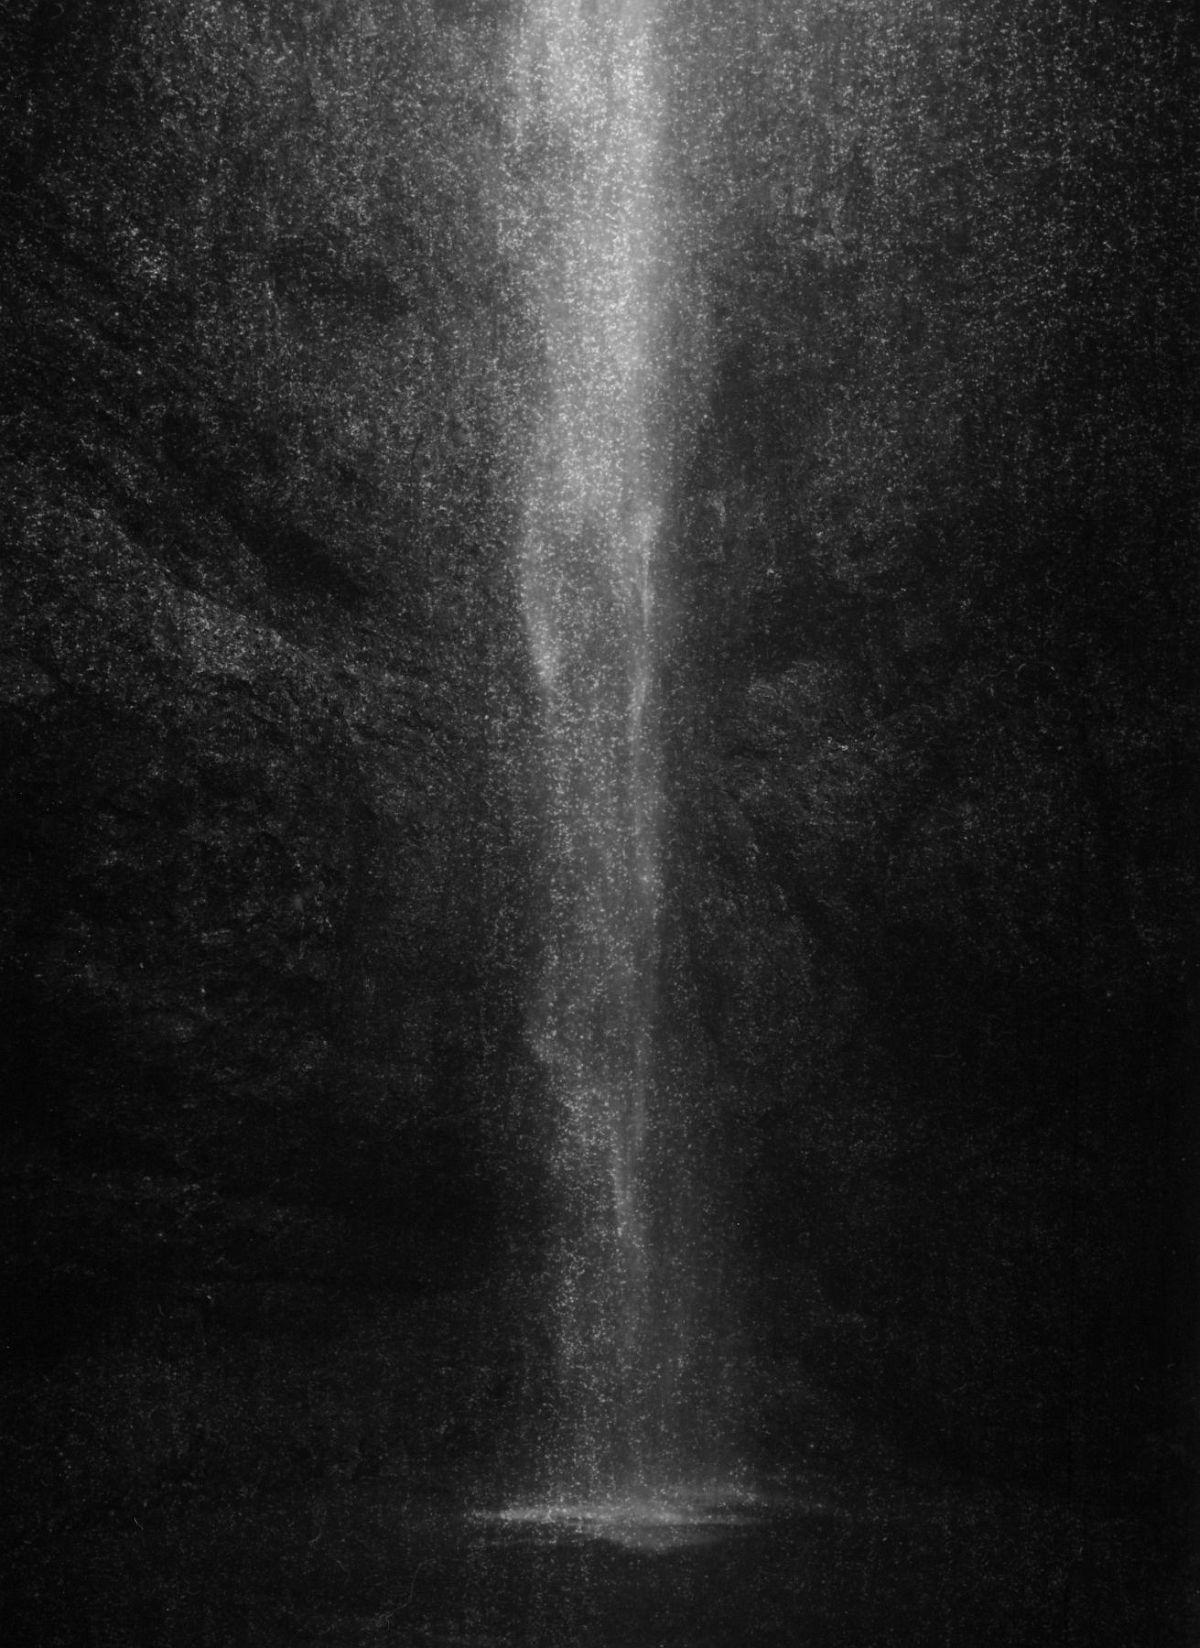 Taca Sui 塔可 Mt. Kuocang Grotto 括苍洞天 2017 Archival pigment print 收藏级艺术打印 213 x 152 cm (84 x 59 3/4 in)